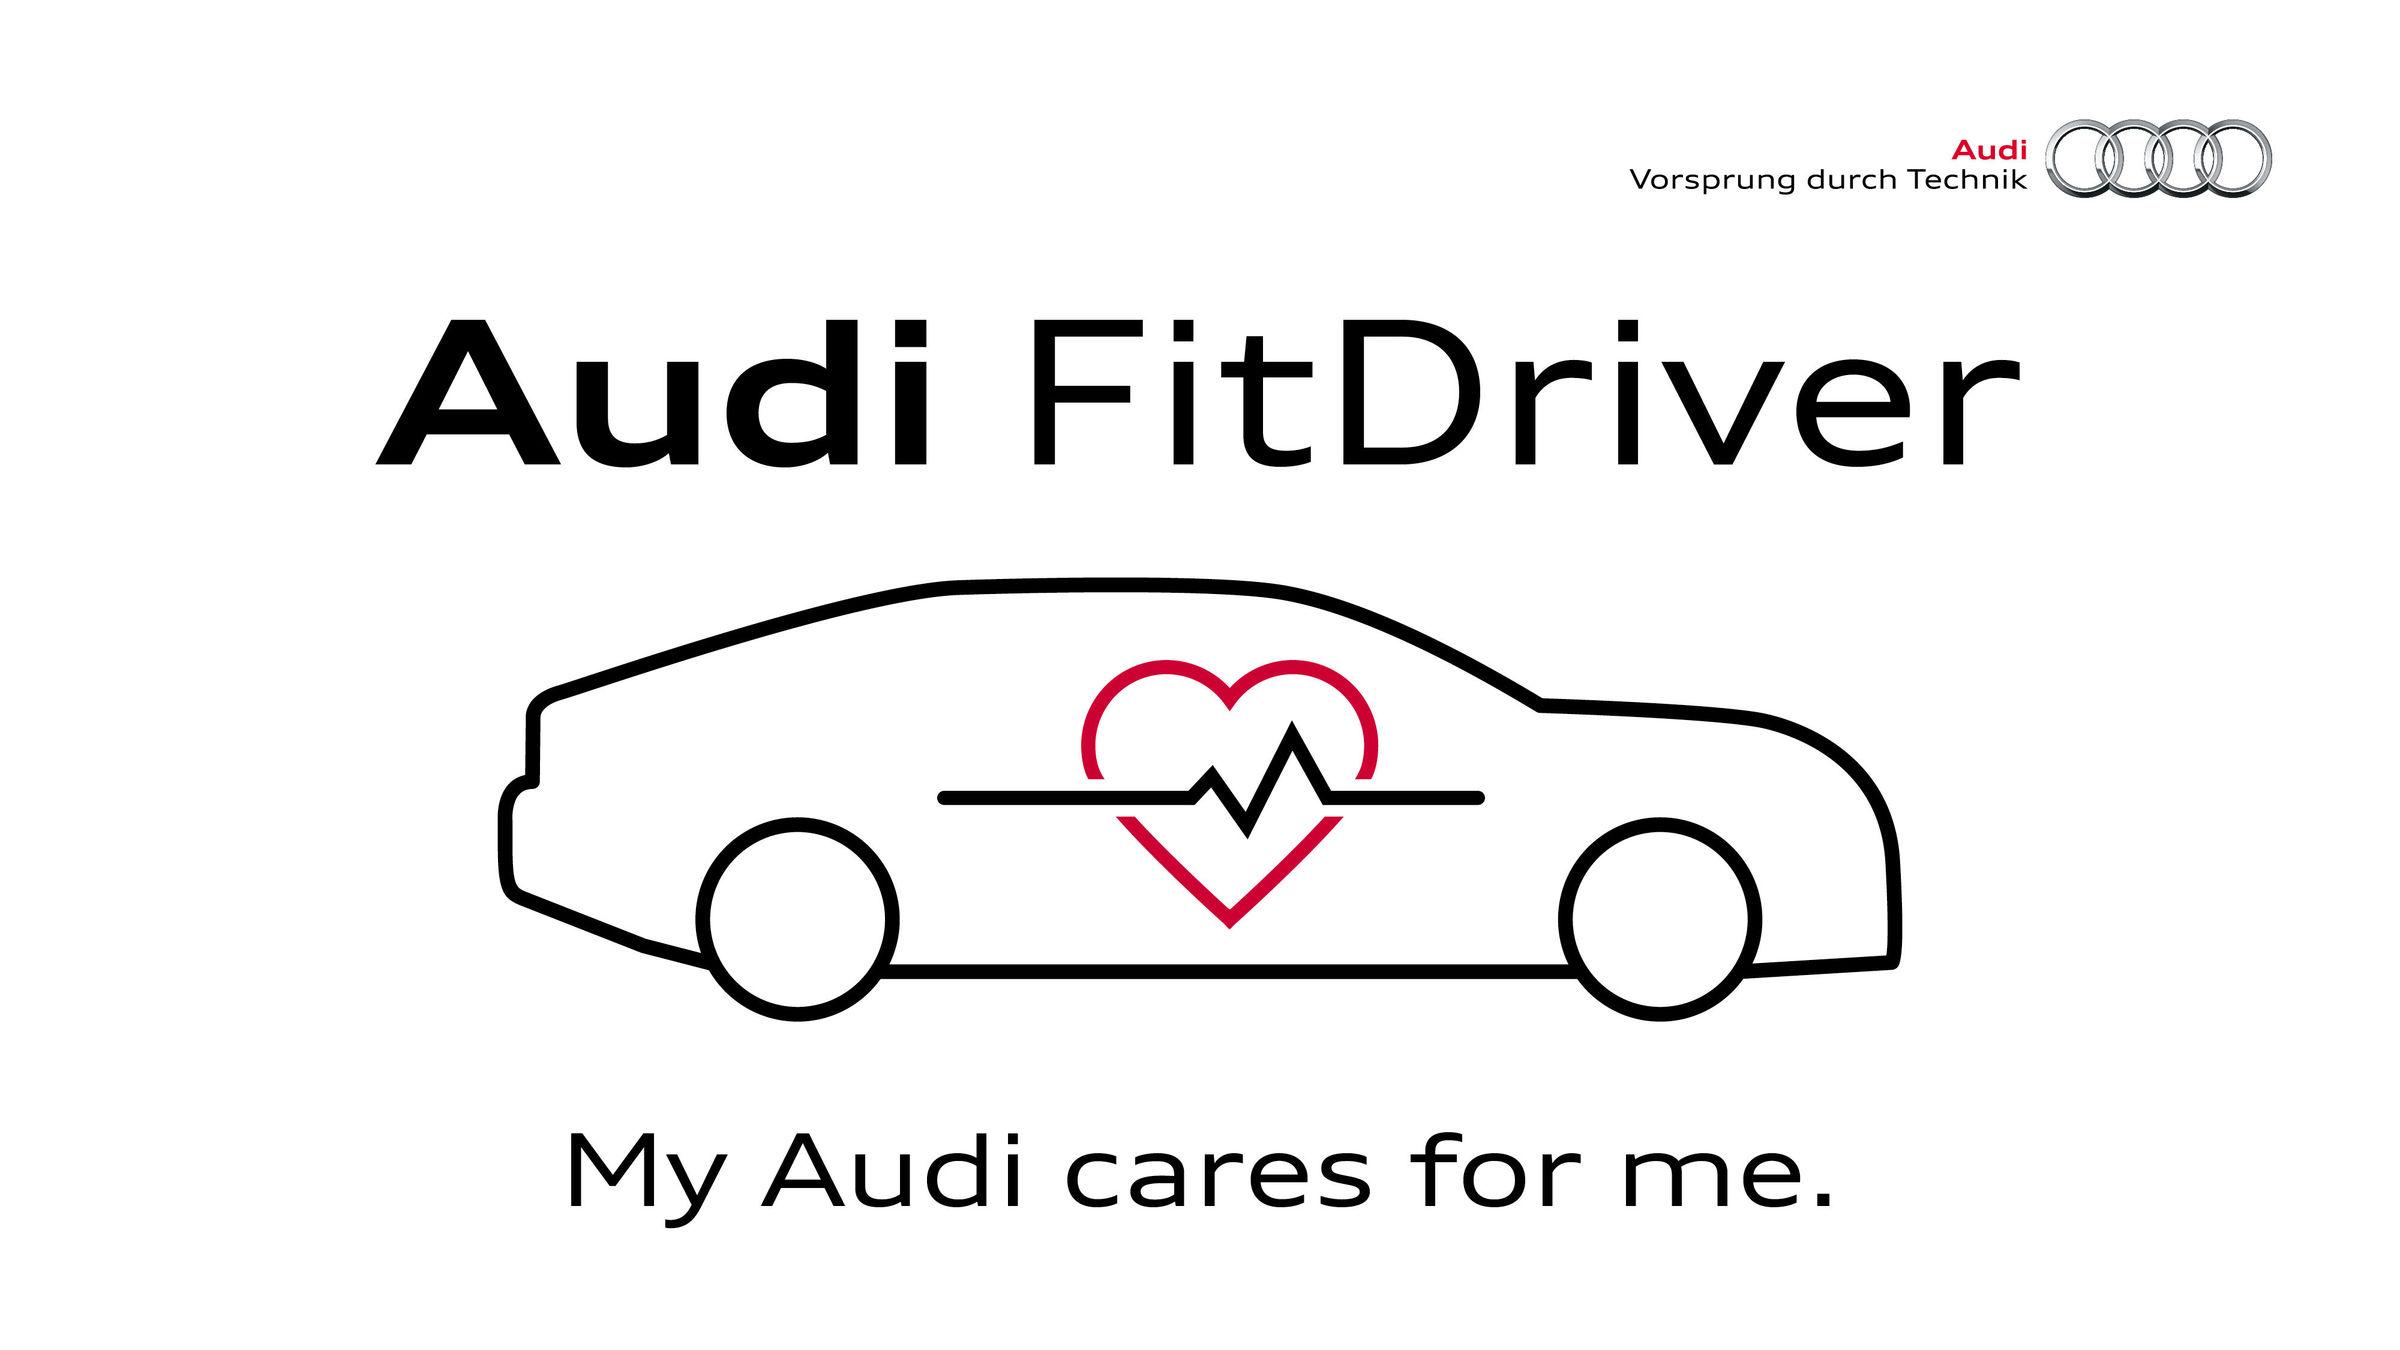 Audi FitDriver